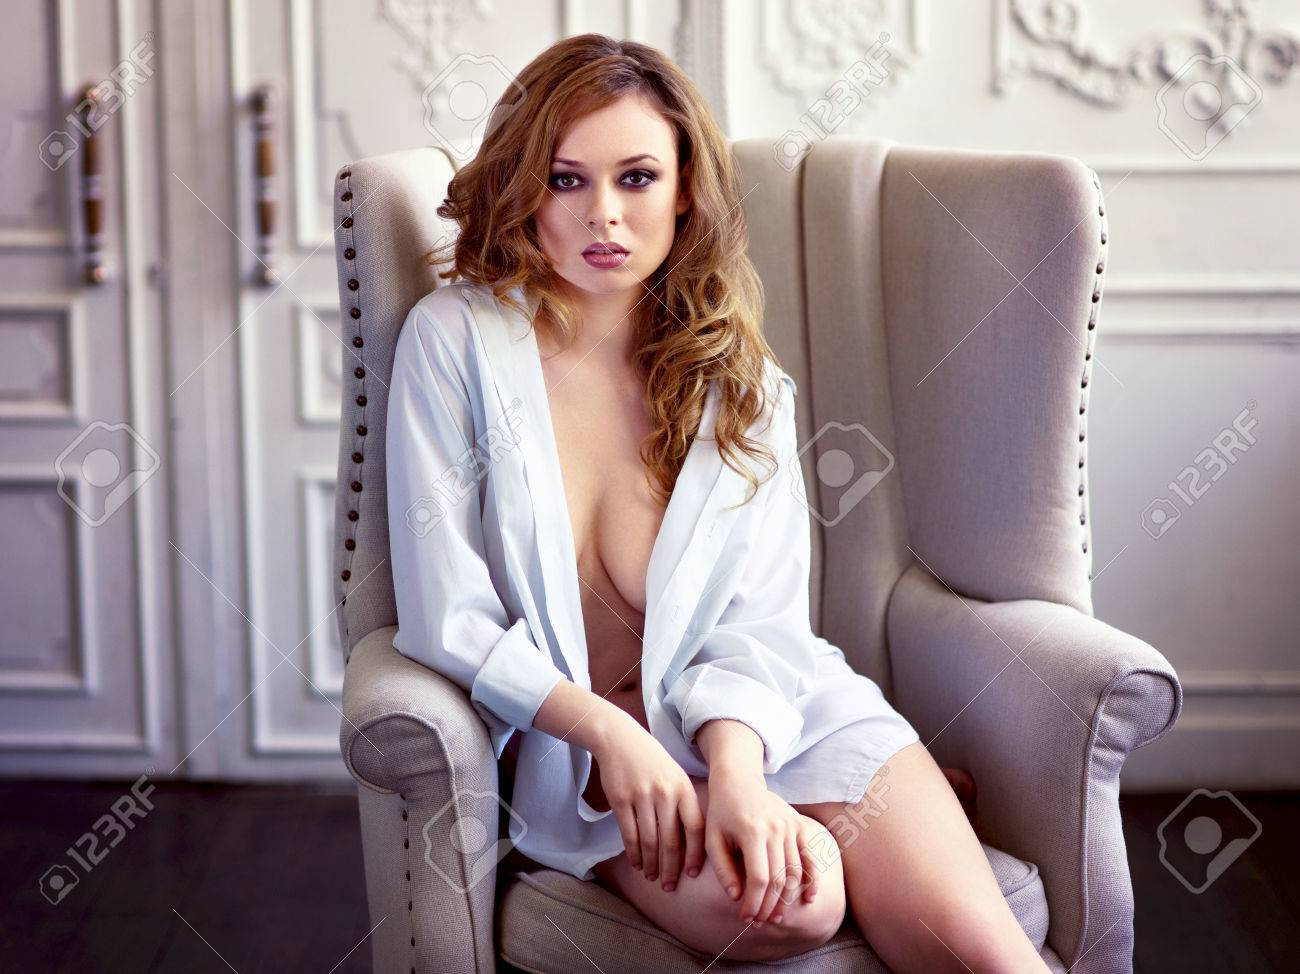 Beautiful redhair woman in white shirt - 79883188